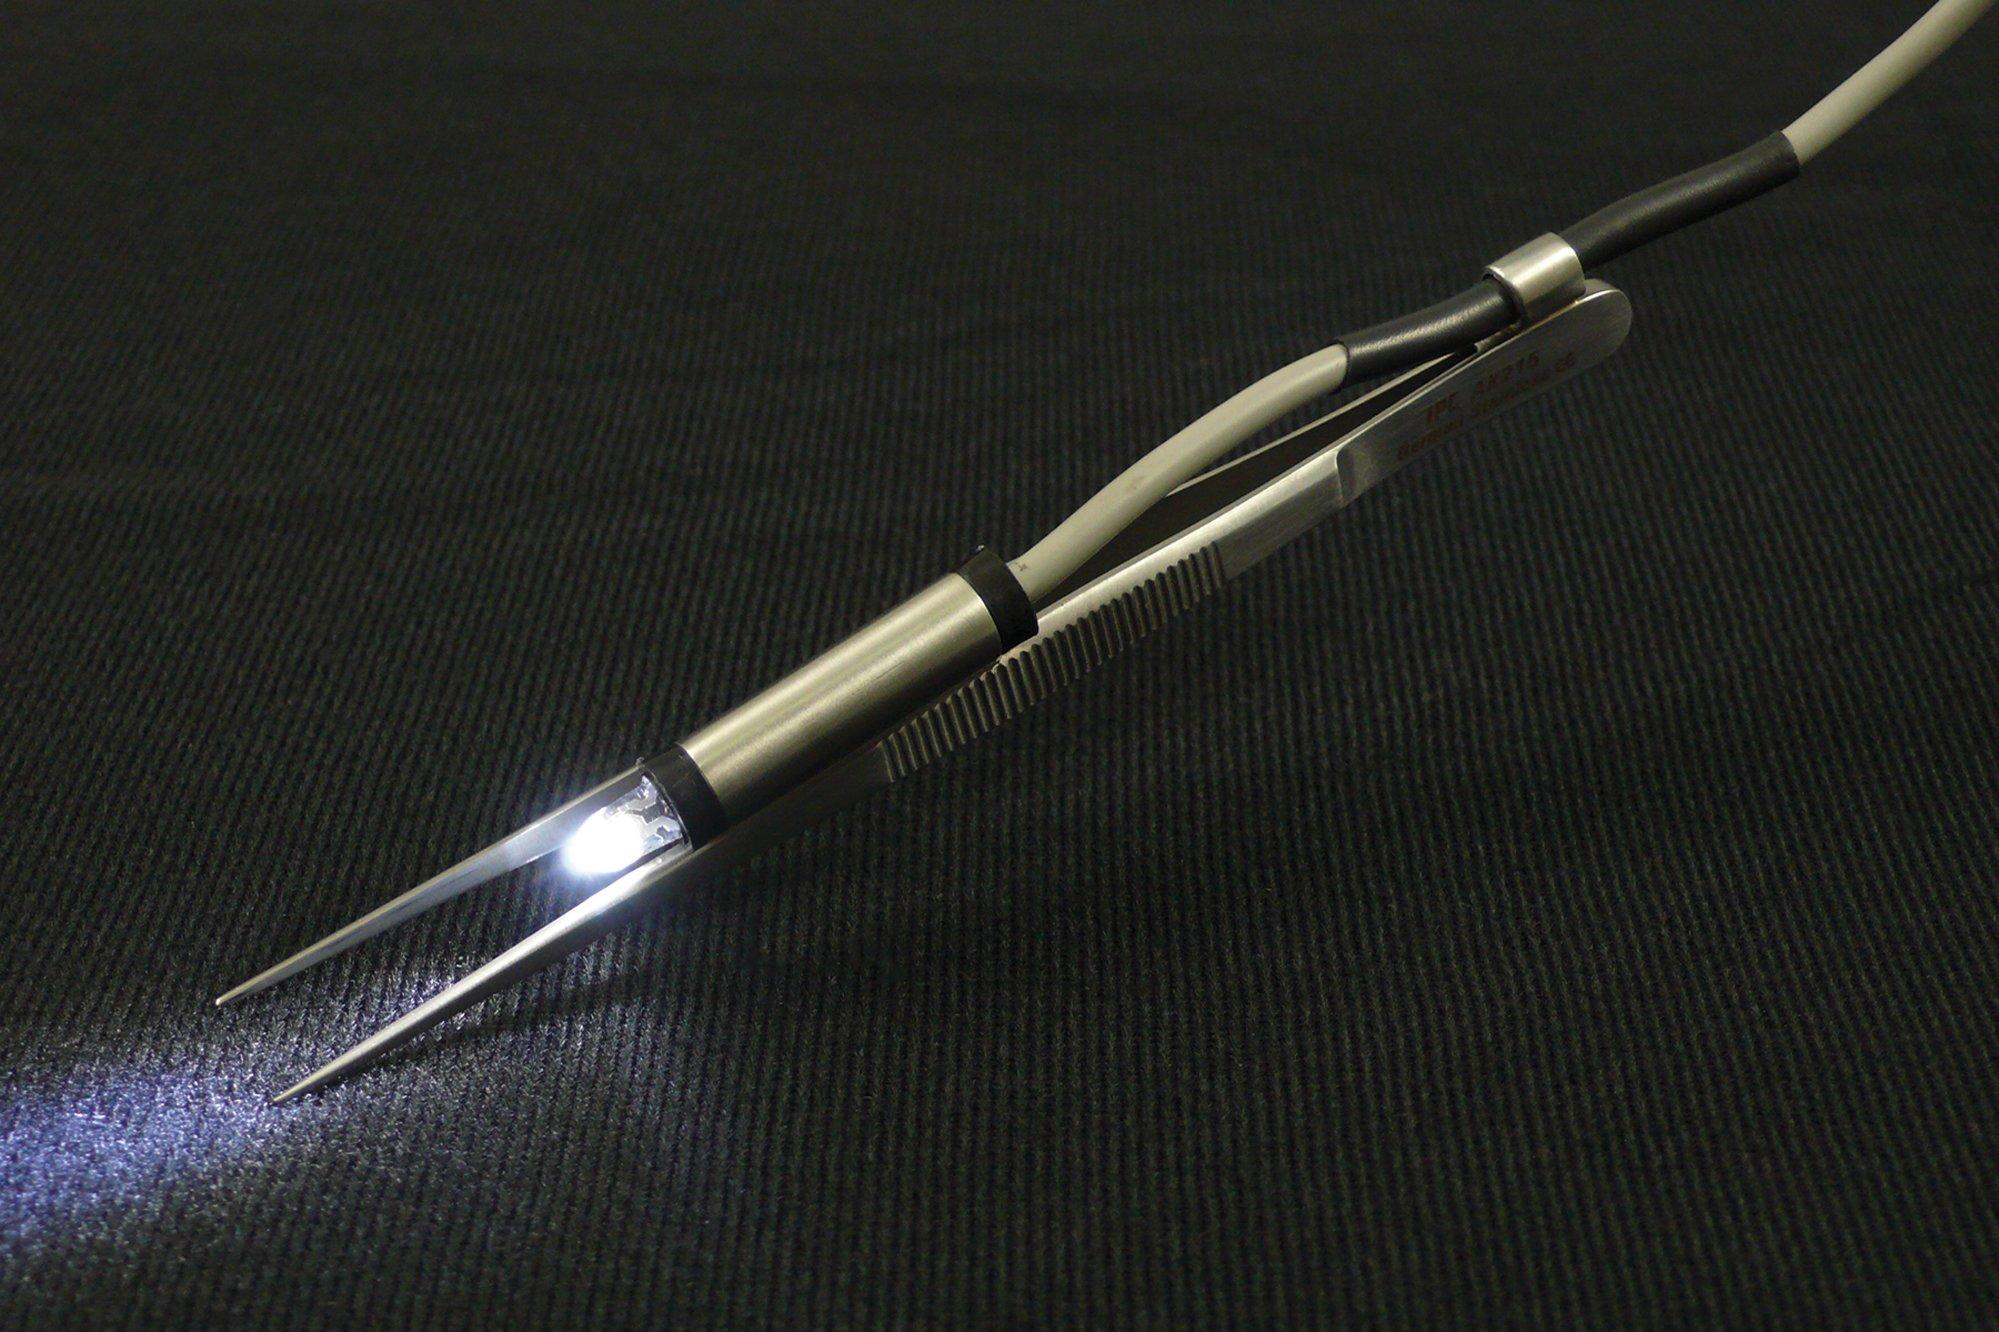 Illum-a-field Illuminated Embedding Forceps - 15cm